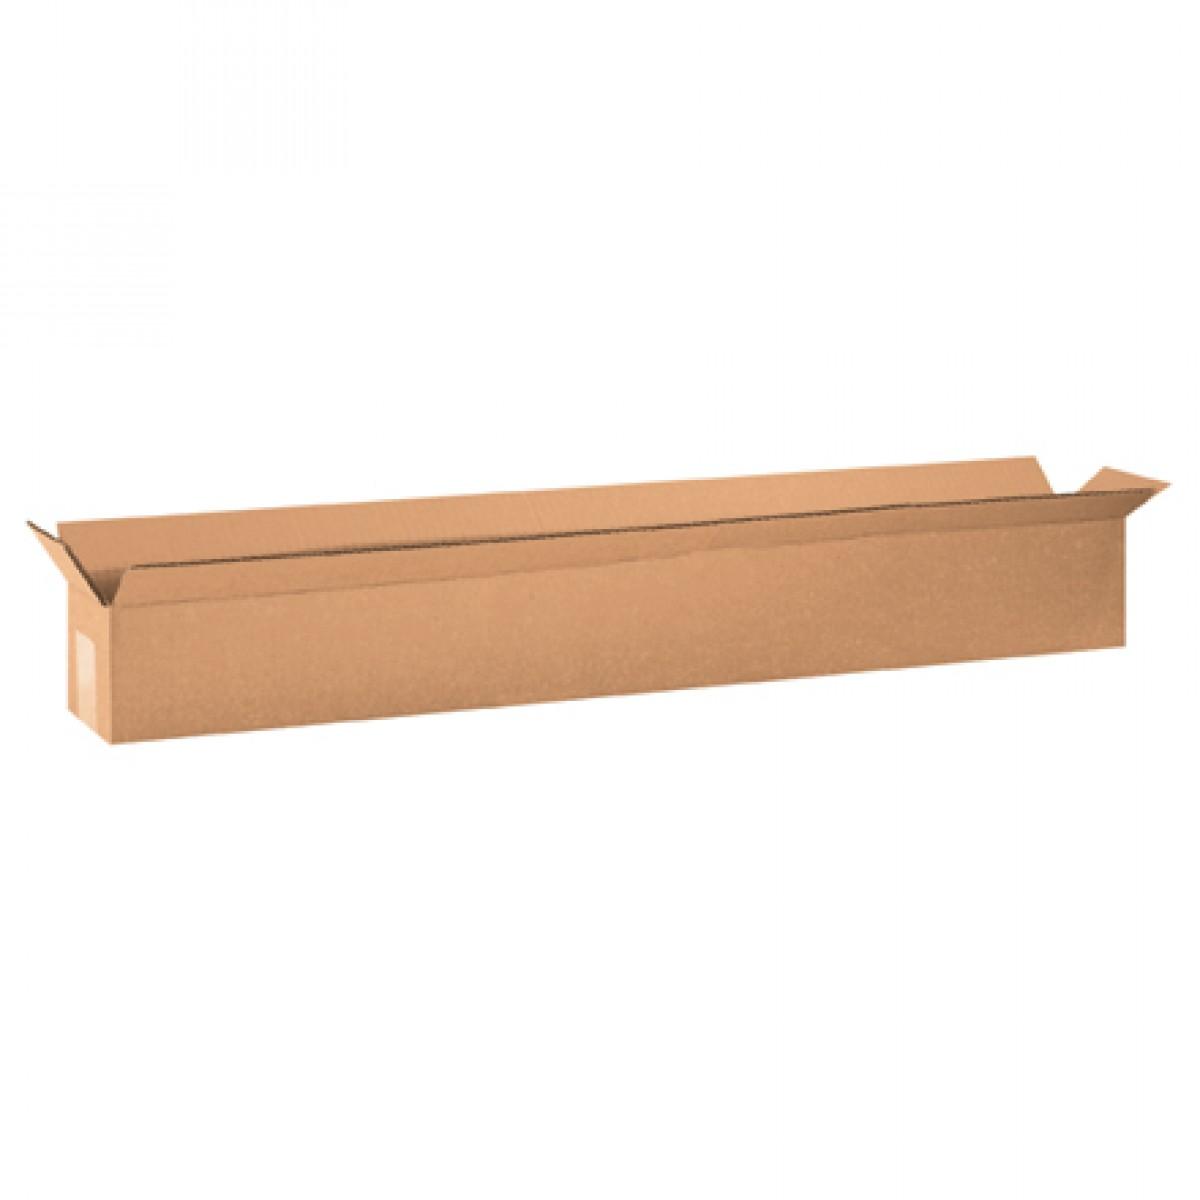 36 x 4 x 4 long corrugated boxes. Black Bedroom Furniture Sets. Home Design Ideas